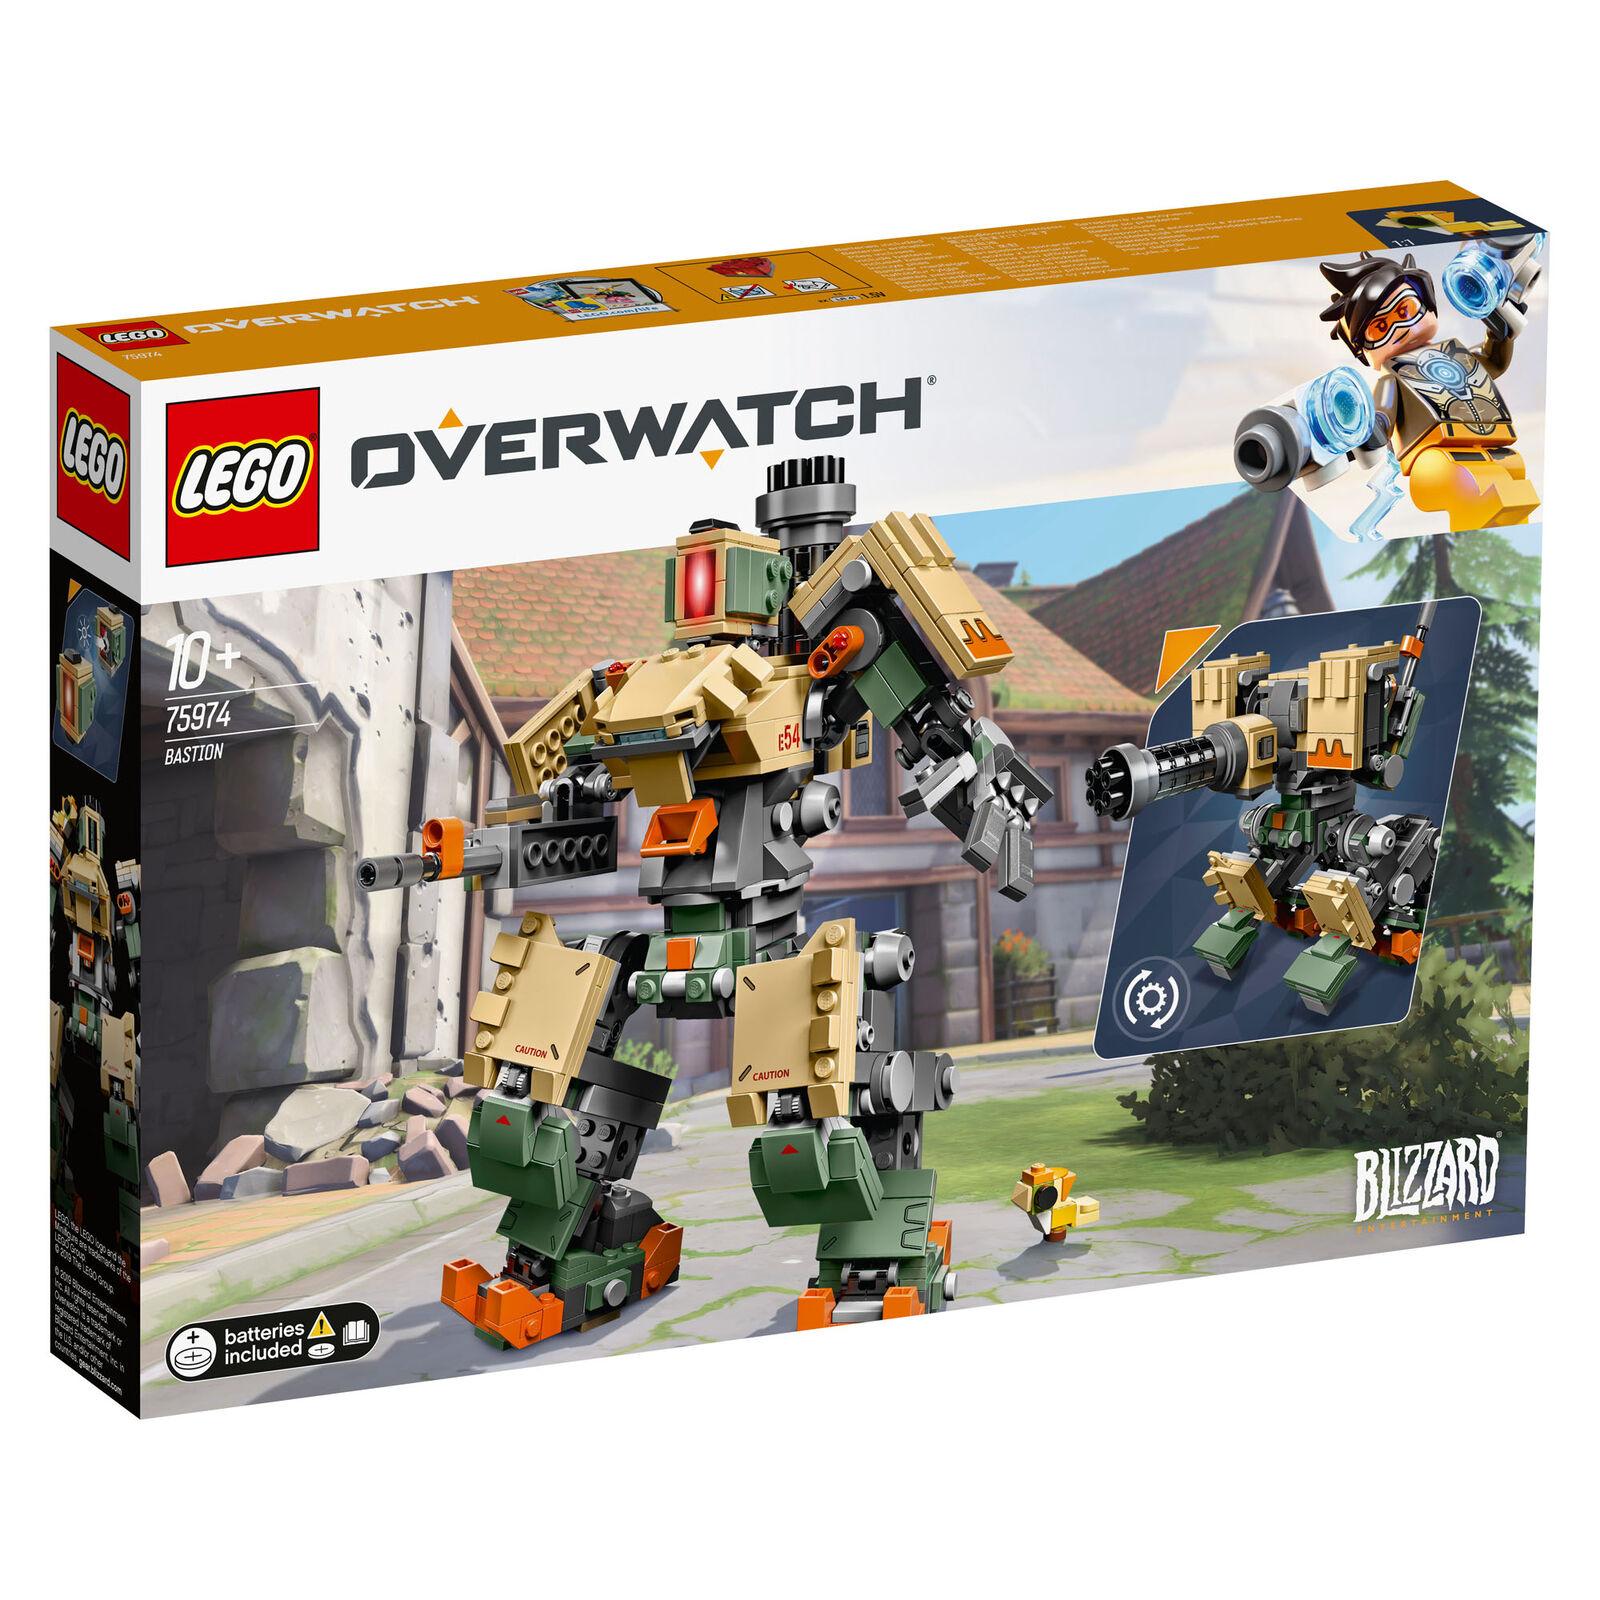 75974 LEGO Overwatch Bastion personnage figurine avec armes 602 Pièces Âge 10yrs+